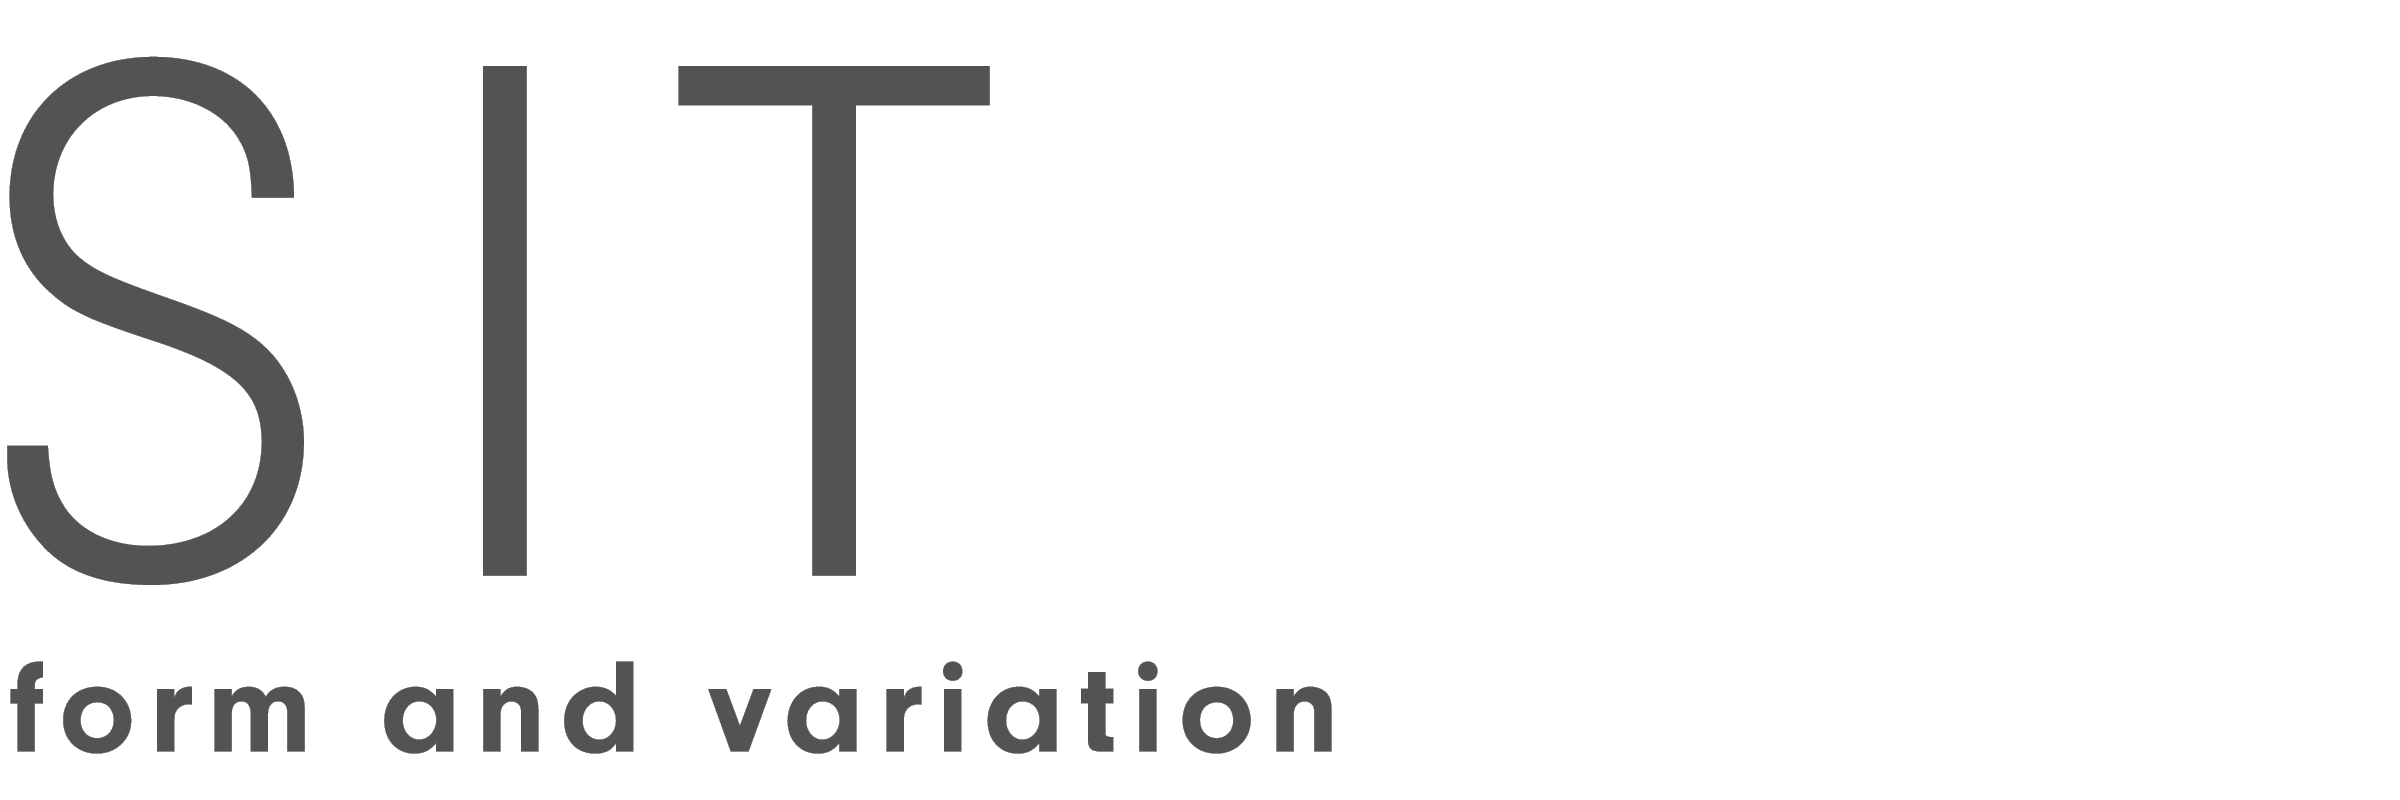 sit_title_03.png